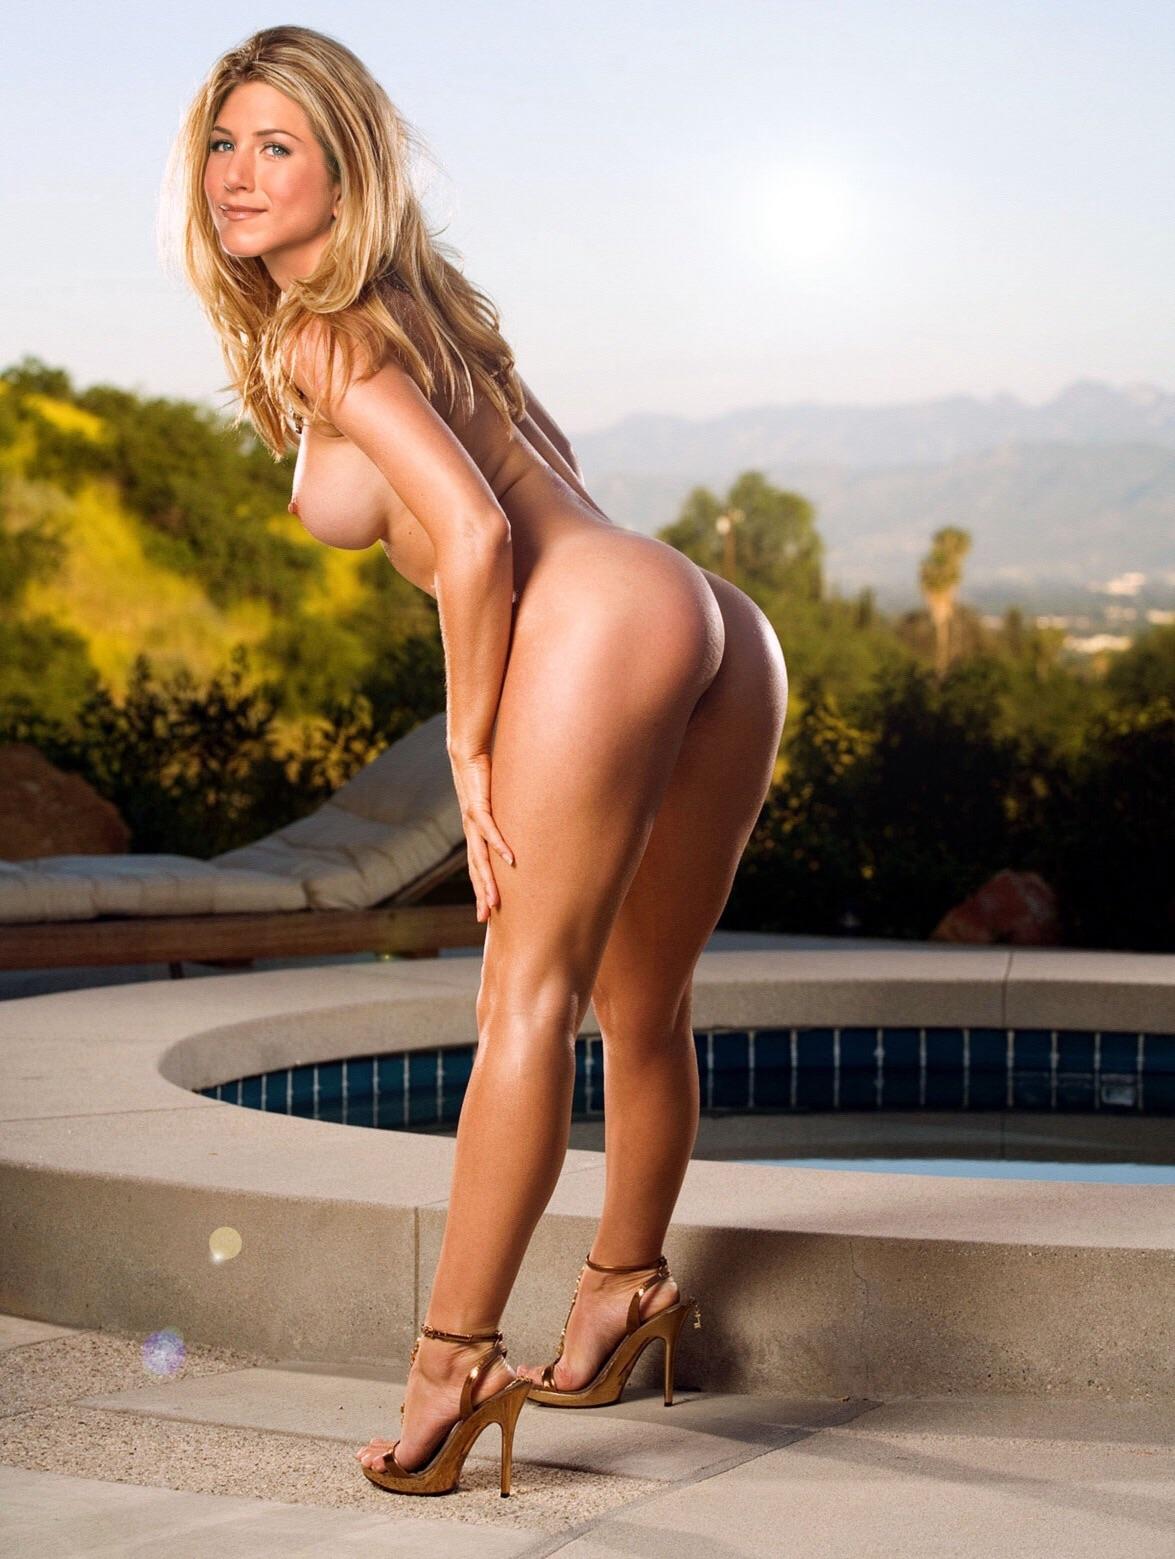 Www leck celebrity nude image com tubezzz porn photos